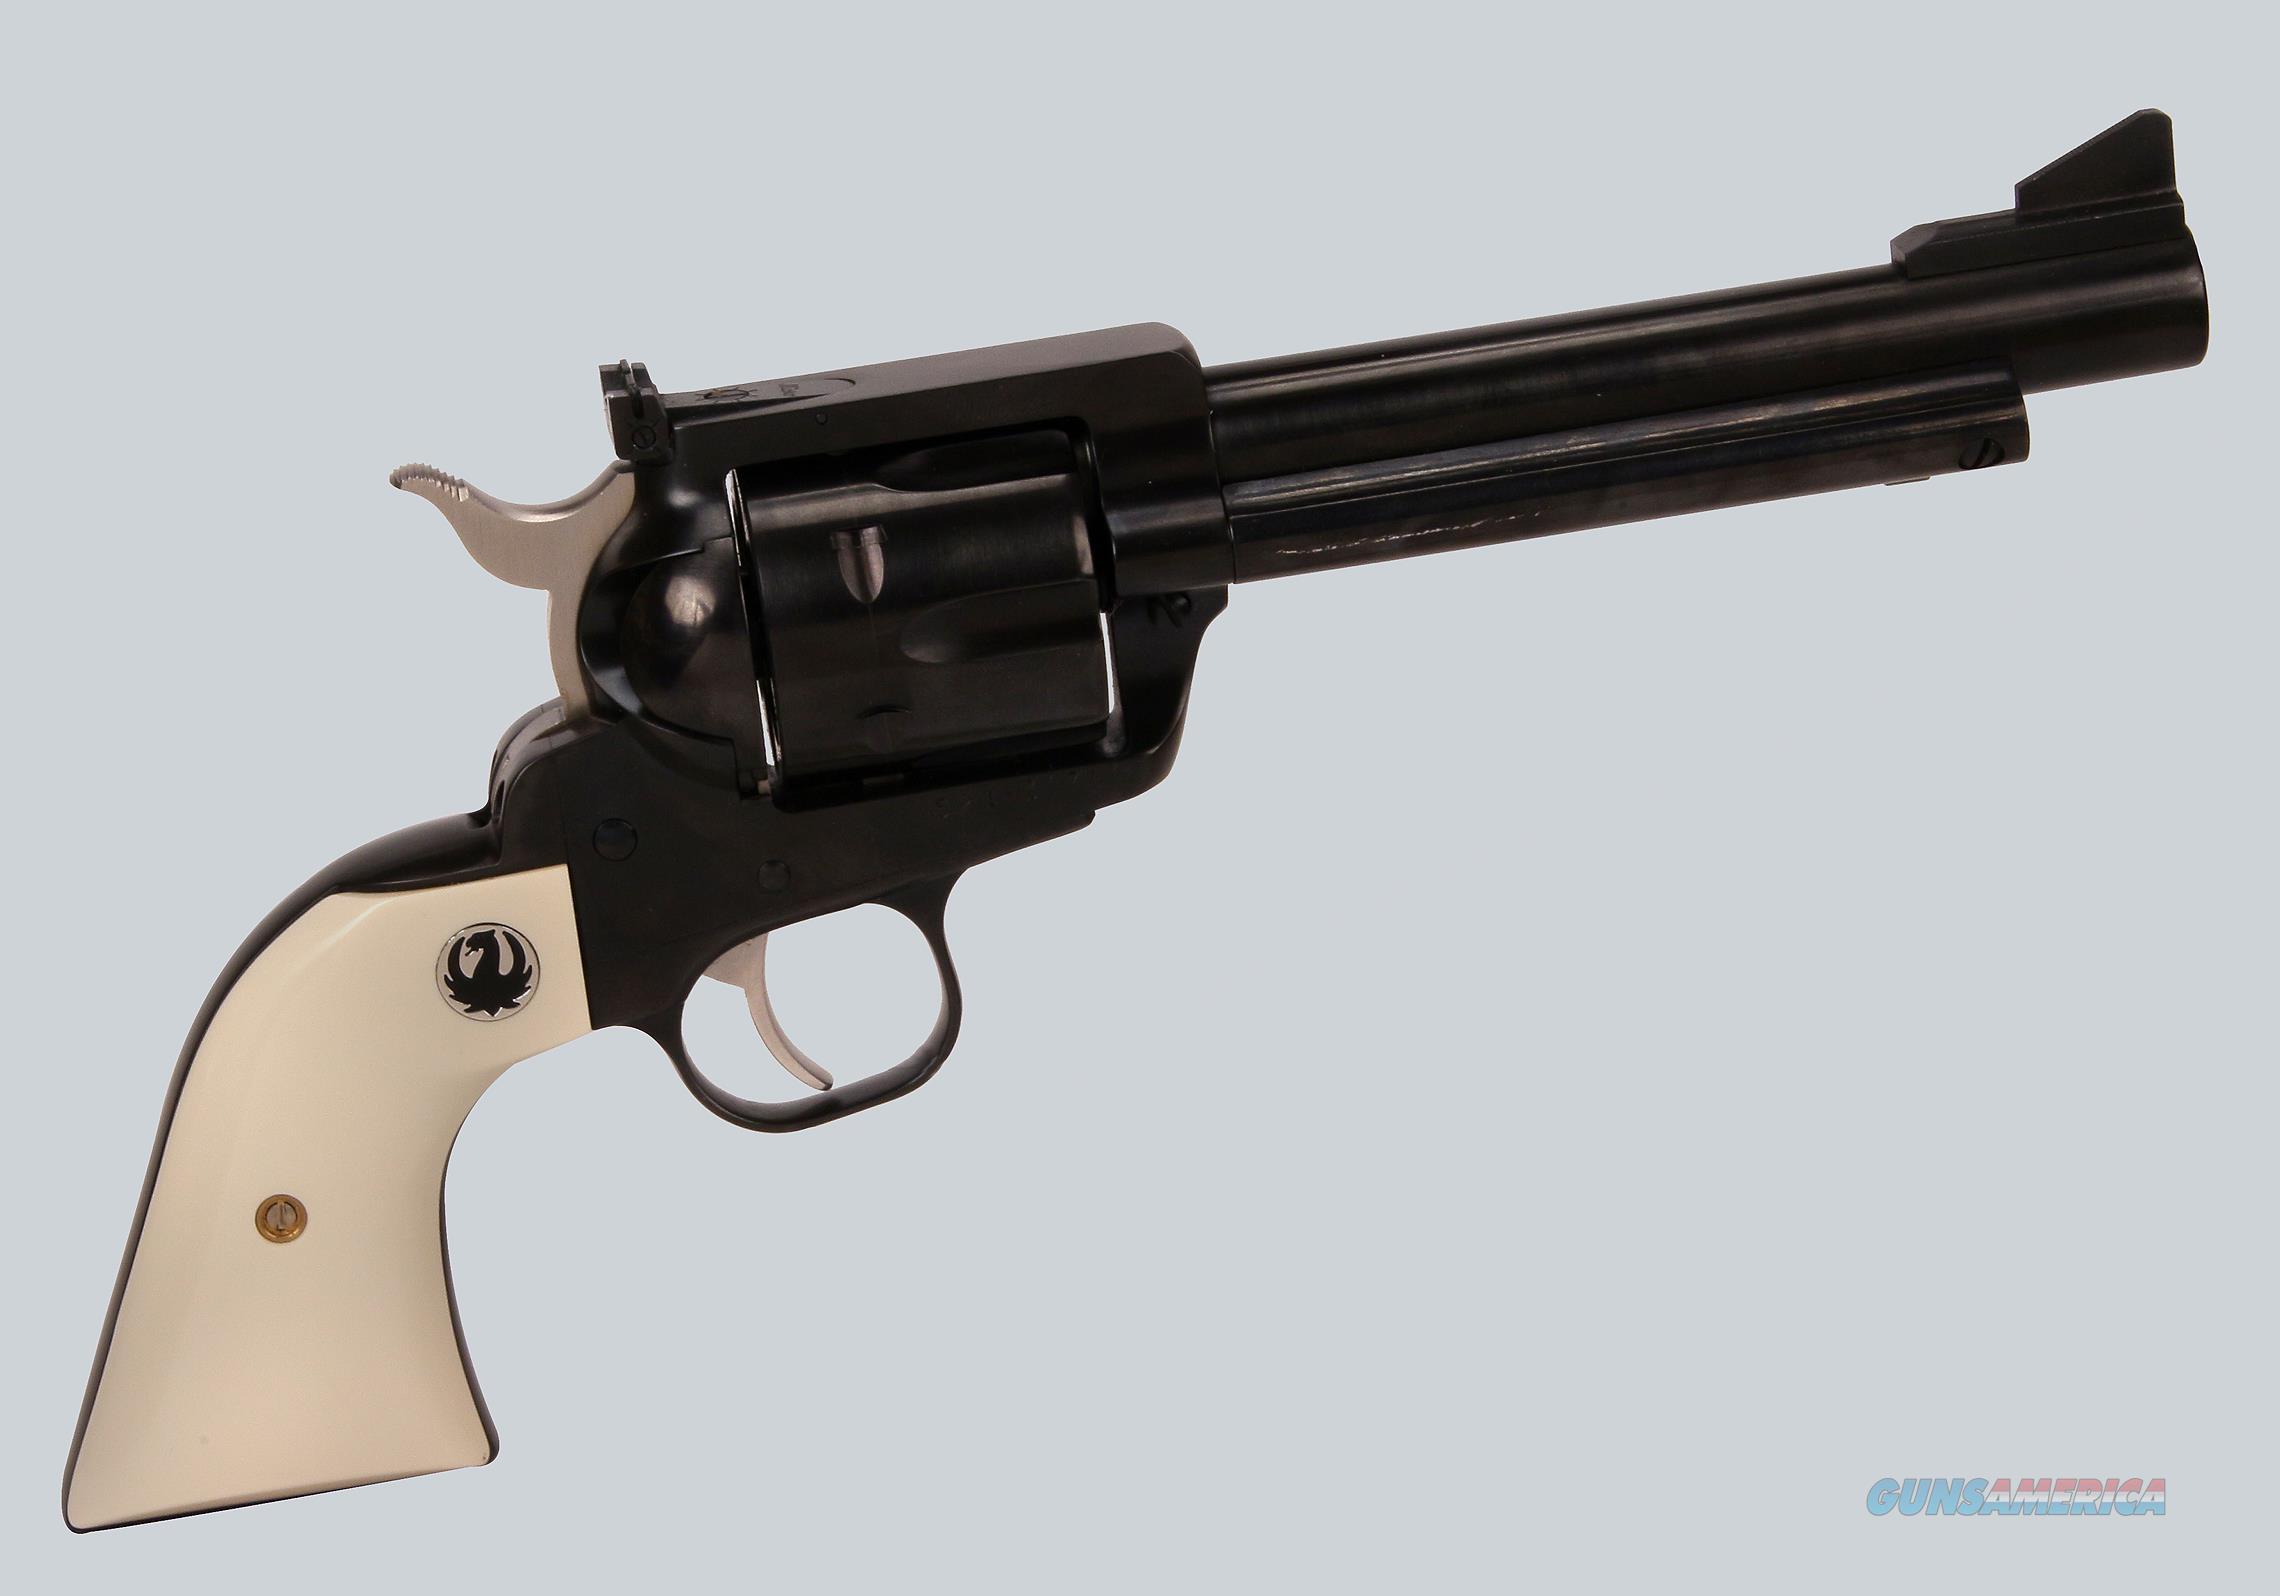 Ruger Blackhawk 45LC/45acp Revolver  Guns > Pistols > Ruger Single Action Revolvers > Blackhawk Type